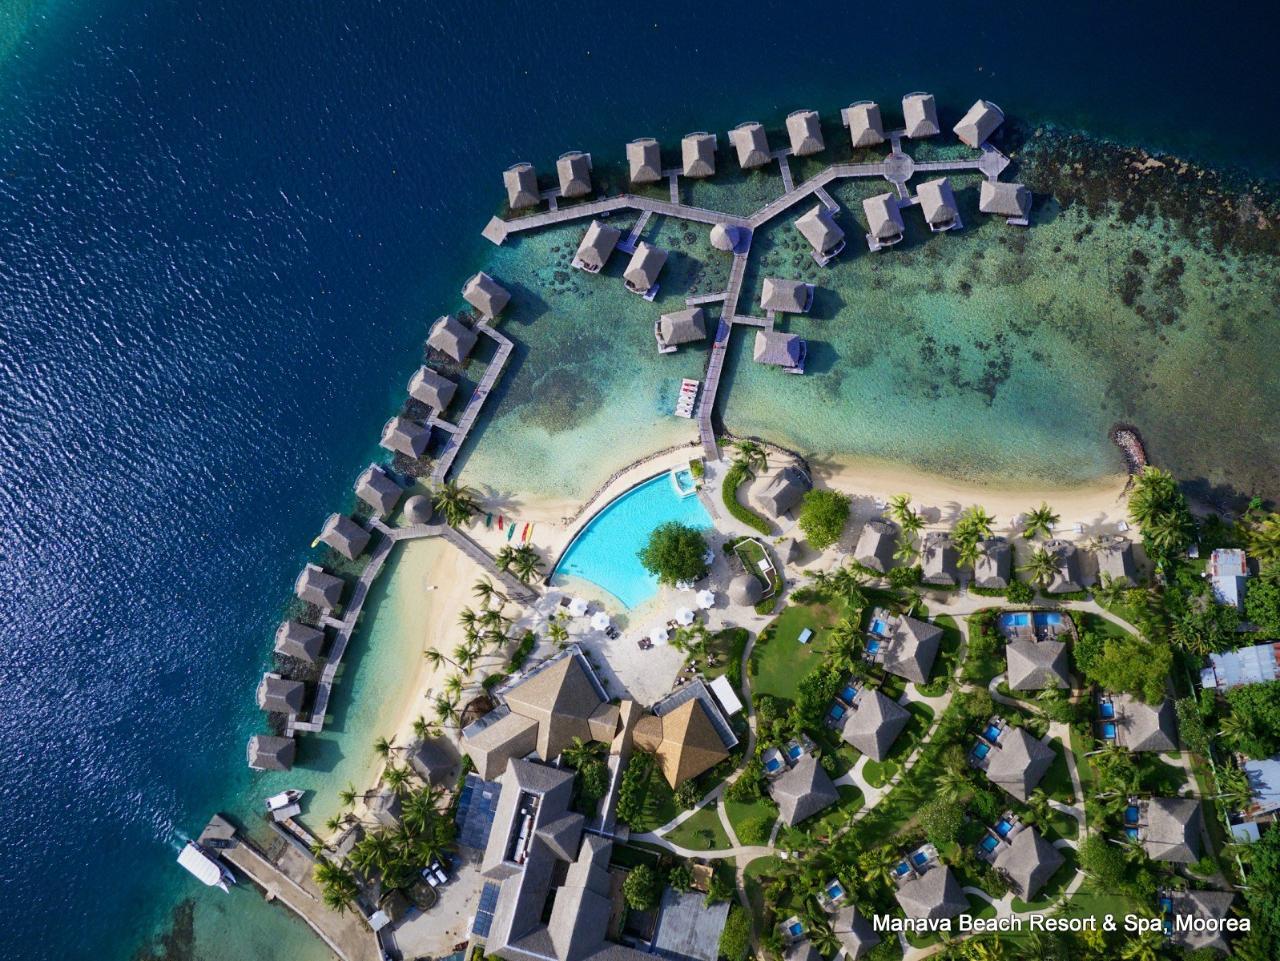 Tahiti & Moorea 7 Night Getaway - Upgrade Package